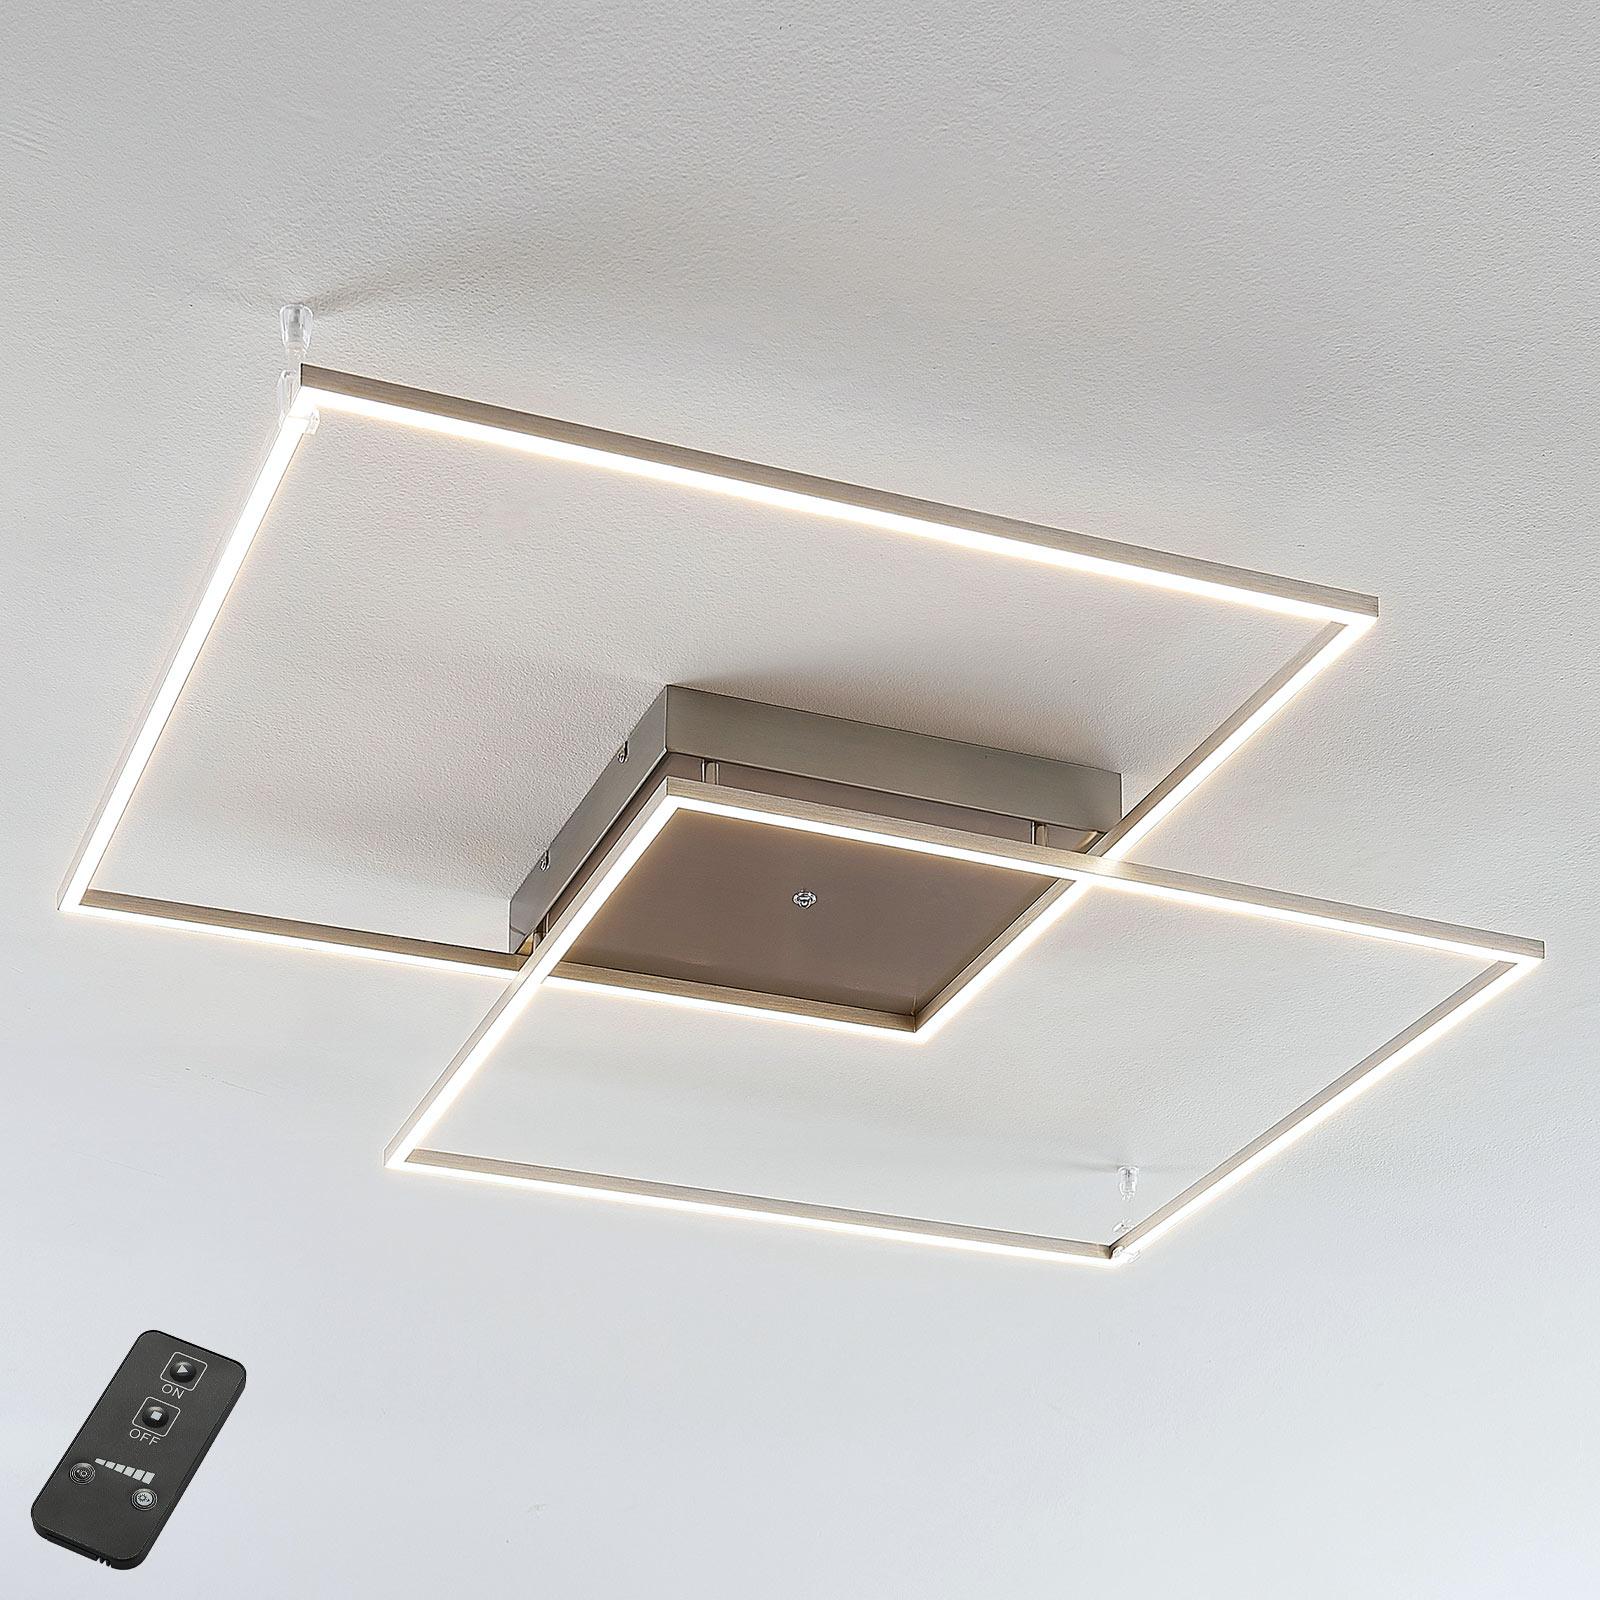 LED-Deckenlampe Mirac 90,2 cm